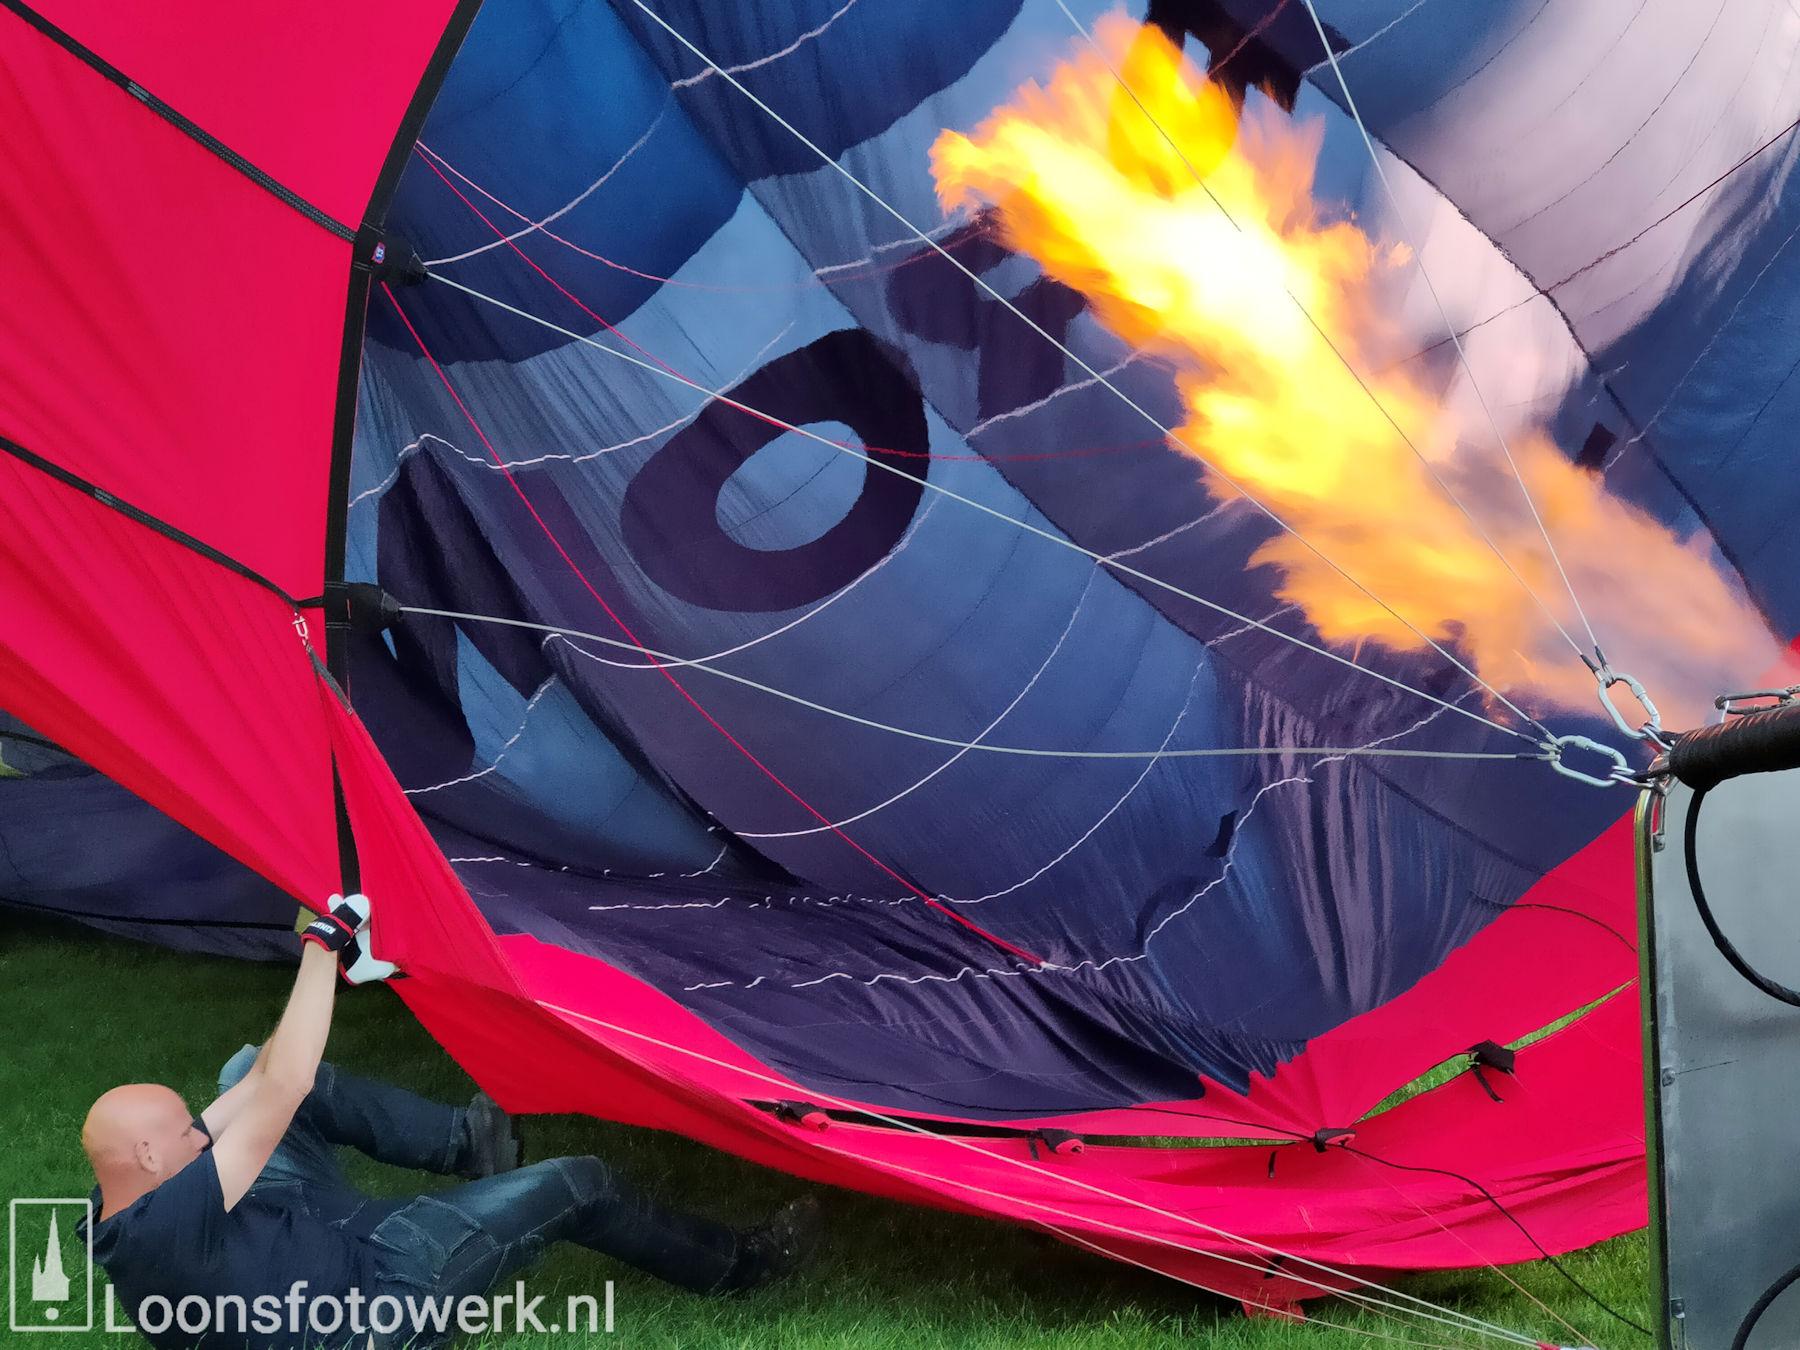 Ballonvaart vanaf de Kasteelweide 20